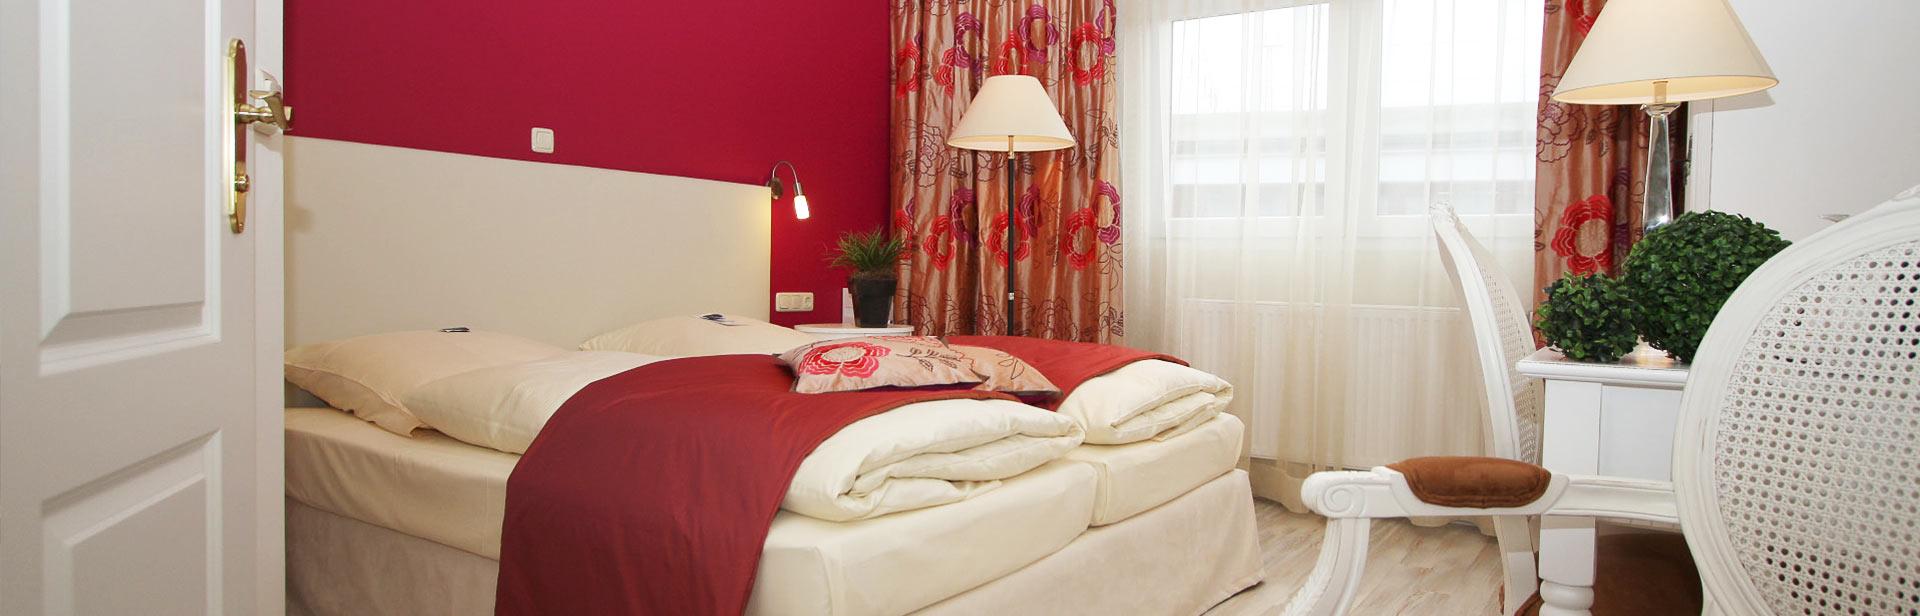 routenplaner zum hotel residence bremen in der stadtmitte. Black Bedroom Furniture Sets. Home Design Ideas